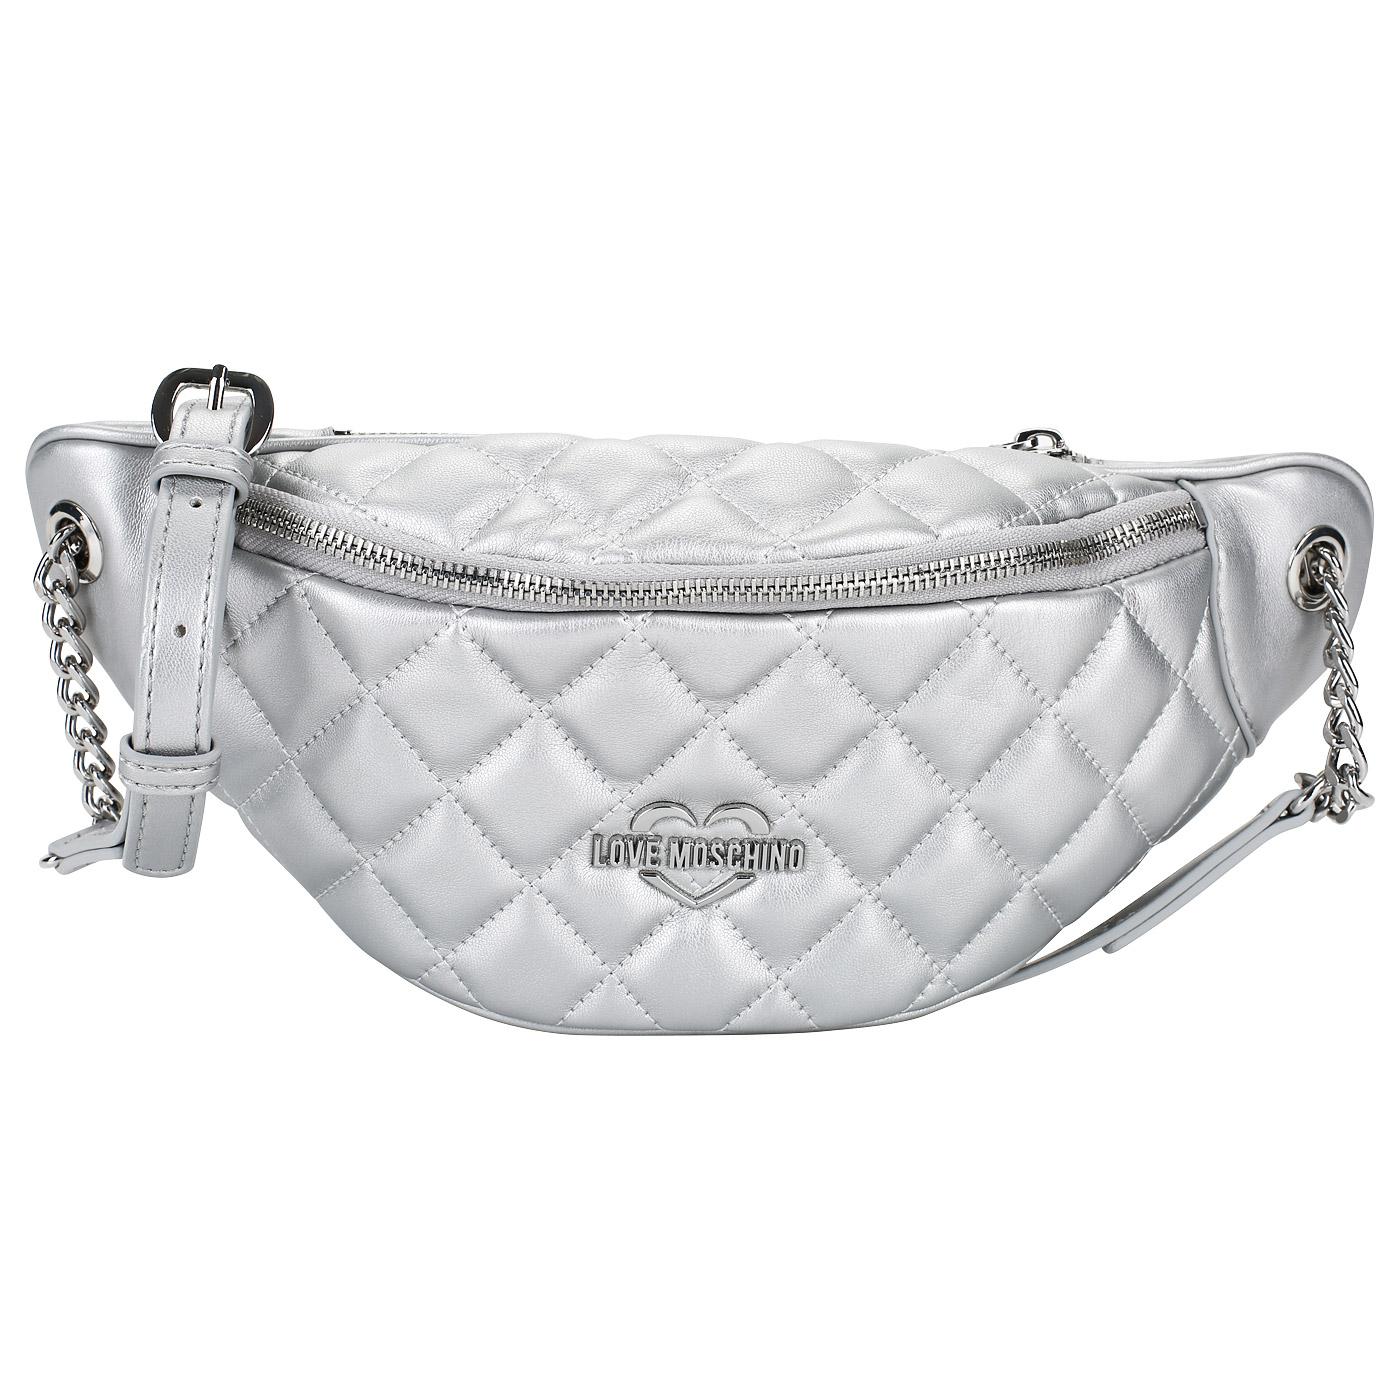 8e3ef2586f46 ... Женская поясная сумка на молнии Love Moschino Quilted Metallic ...